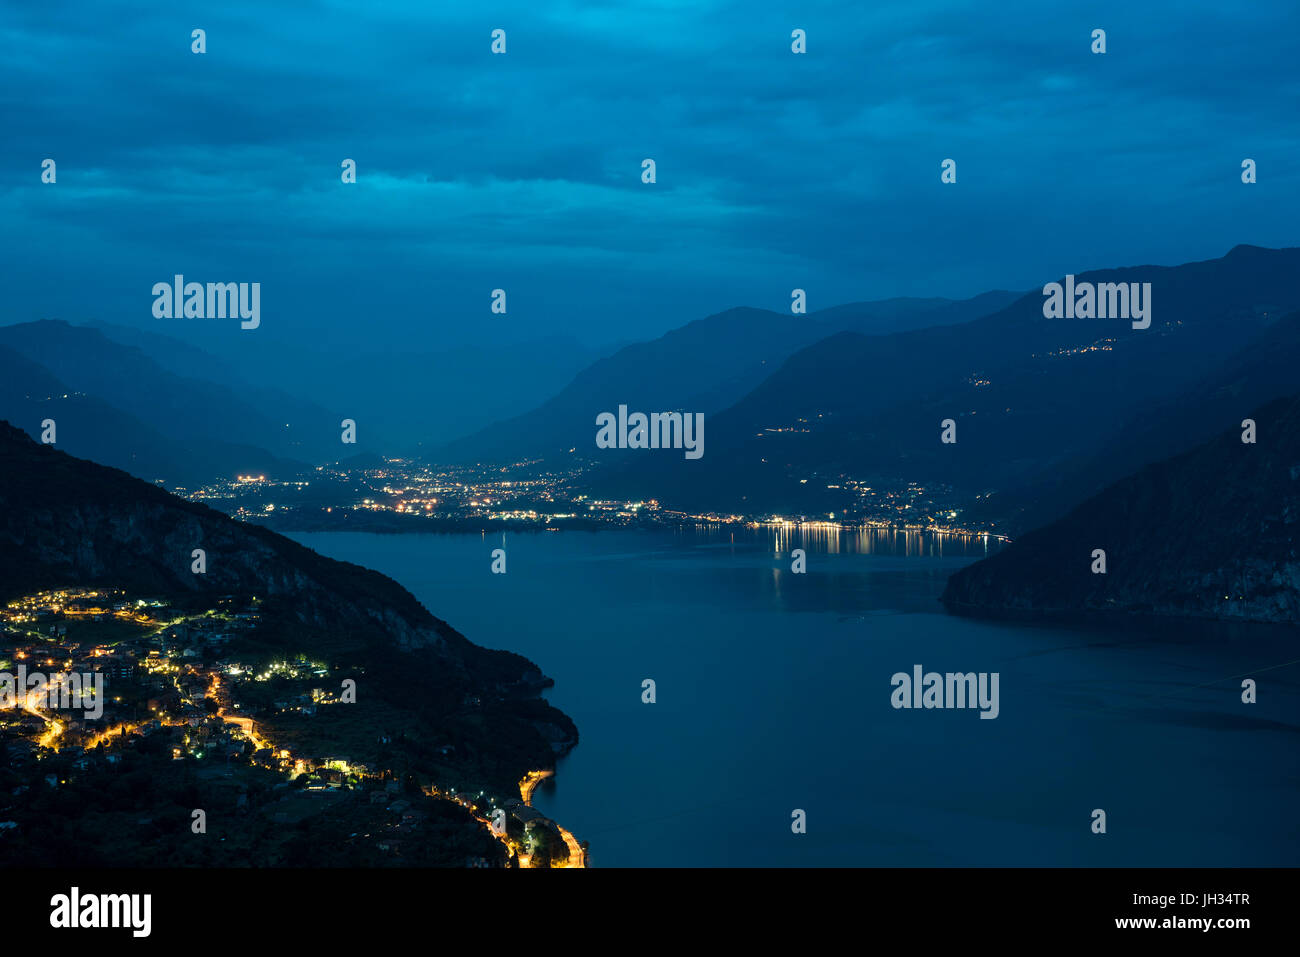 Full Moon Over Lago Iseo, Italy - Stock Image